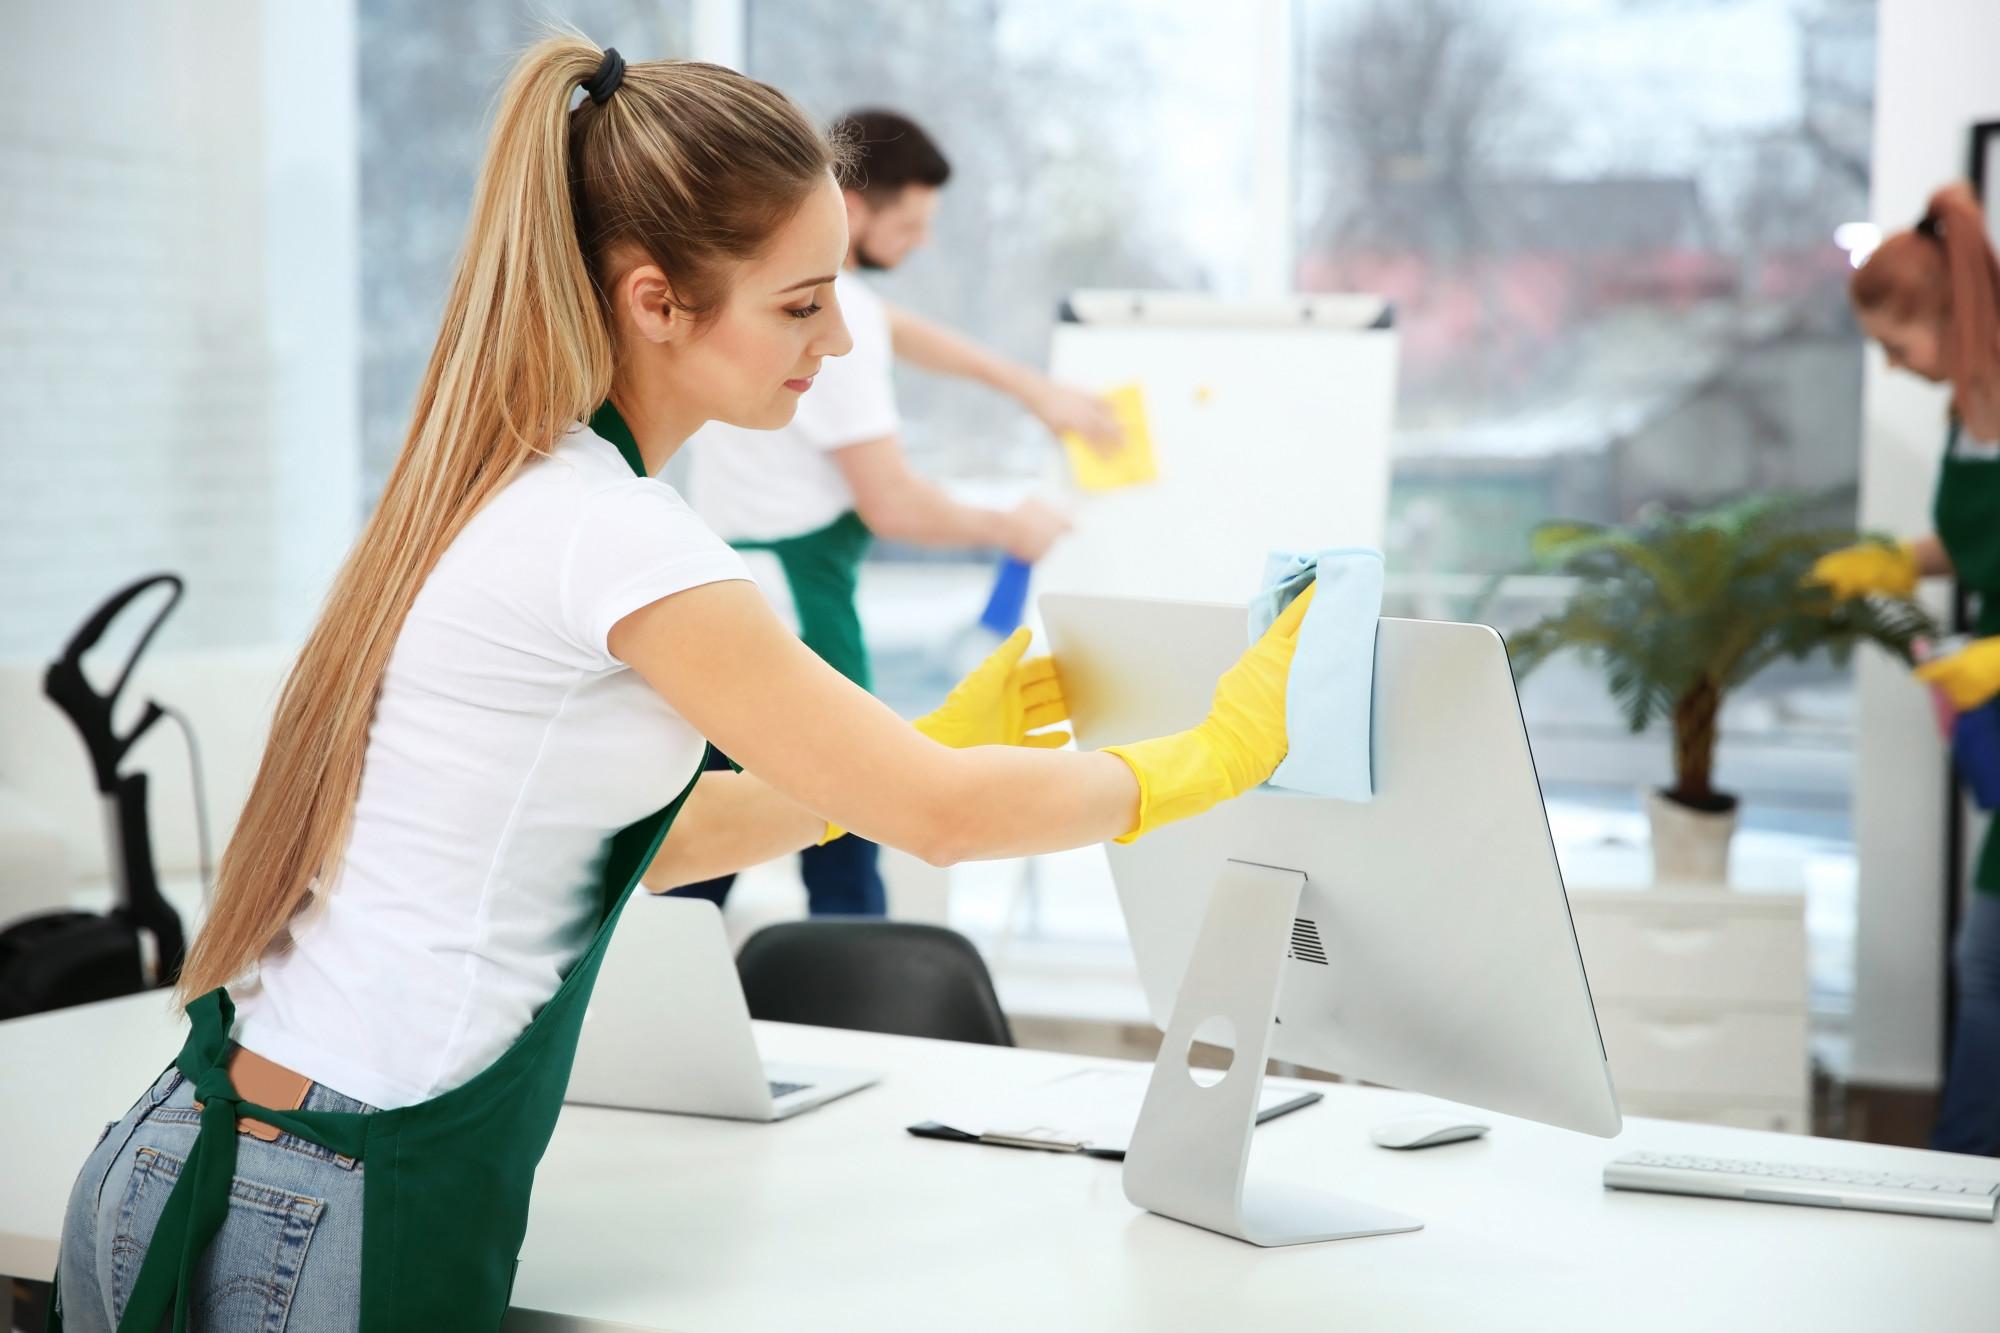 maid hiring